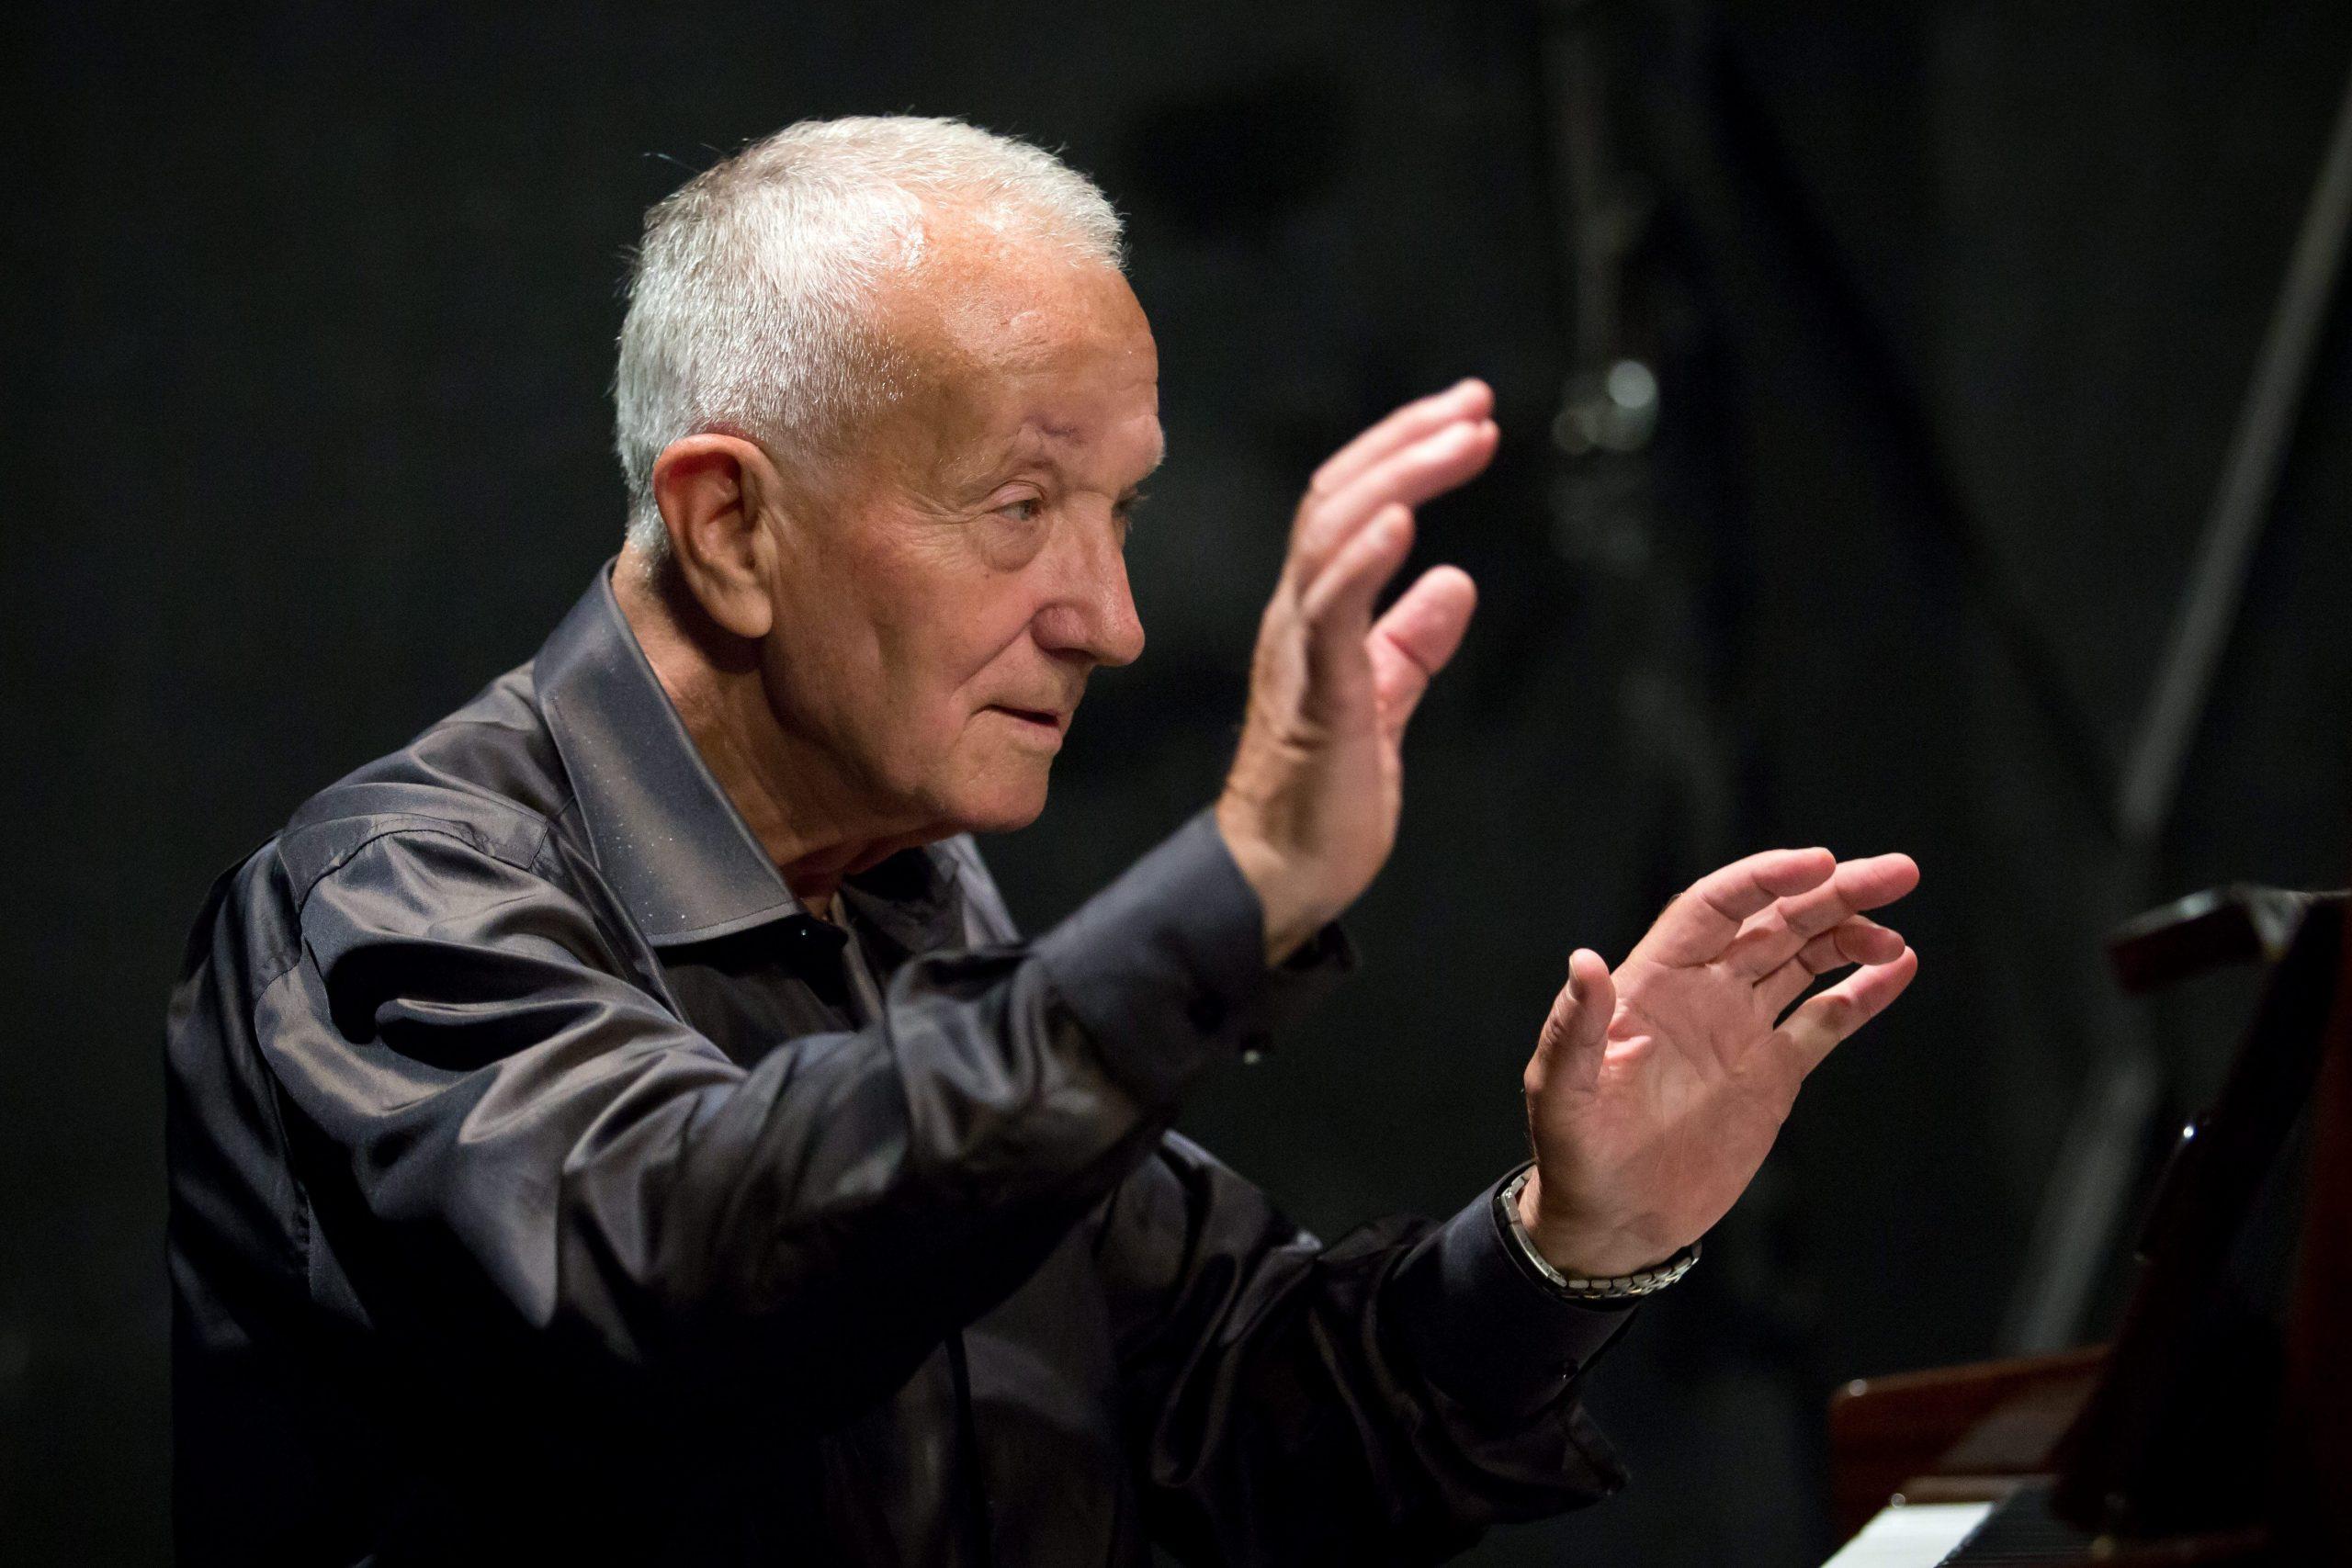 Weltberühmter Arzt und Komponist: György Vukán wäre 80 Jahre alt geworden